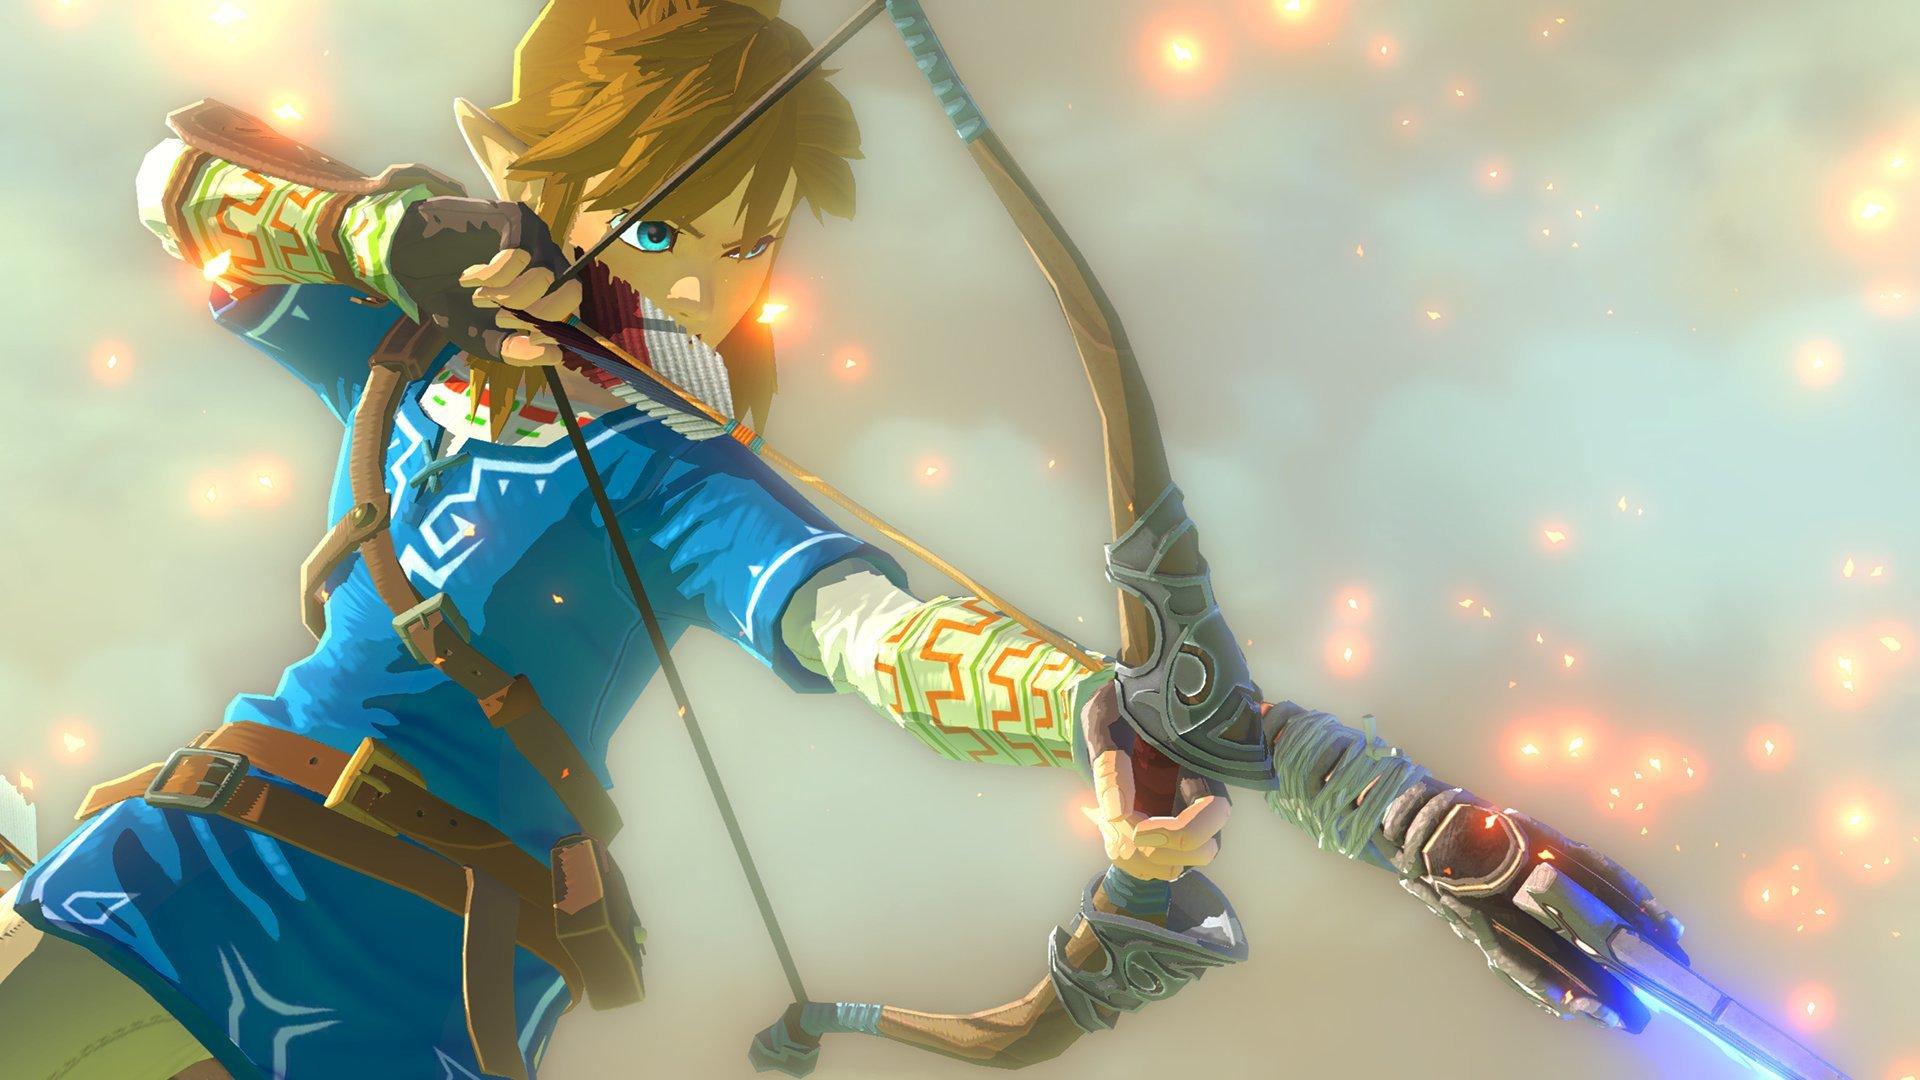 The Legend Of Zelda Breath Of The Wild Wallpapers 1920x1080 Full